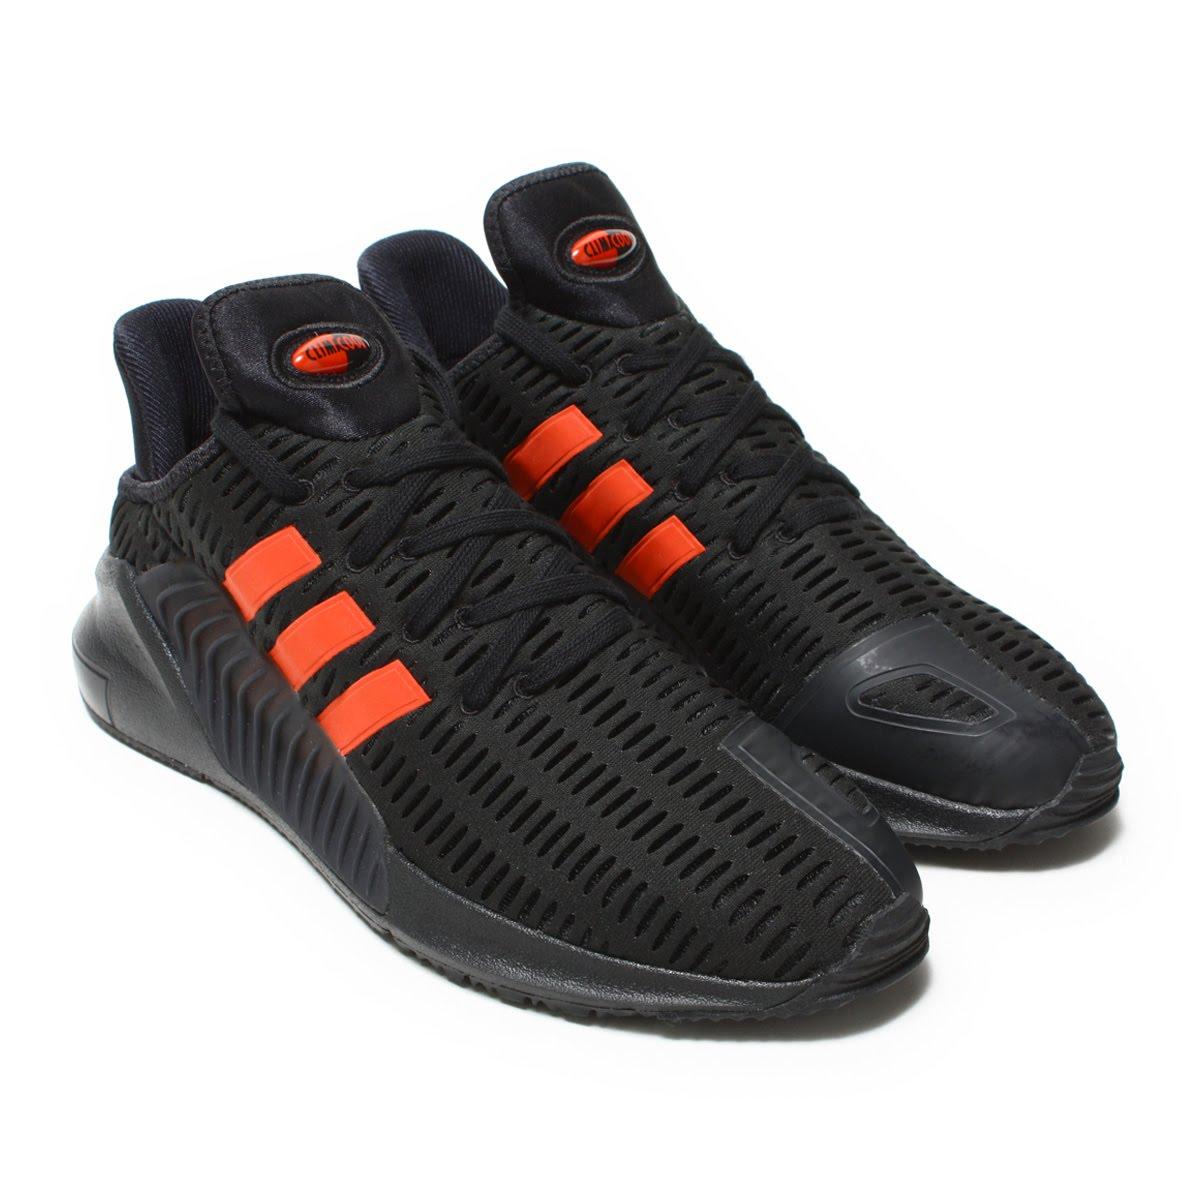 adidas Originals CLIMACOOL 02/17(アディダス オリジナルス クライマクール 02/17)Core Black / Hi-res Red/Core Black18SS-I